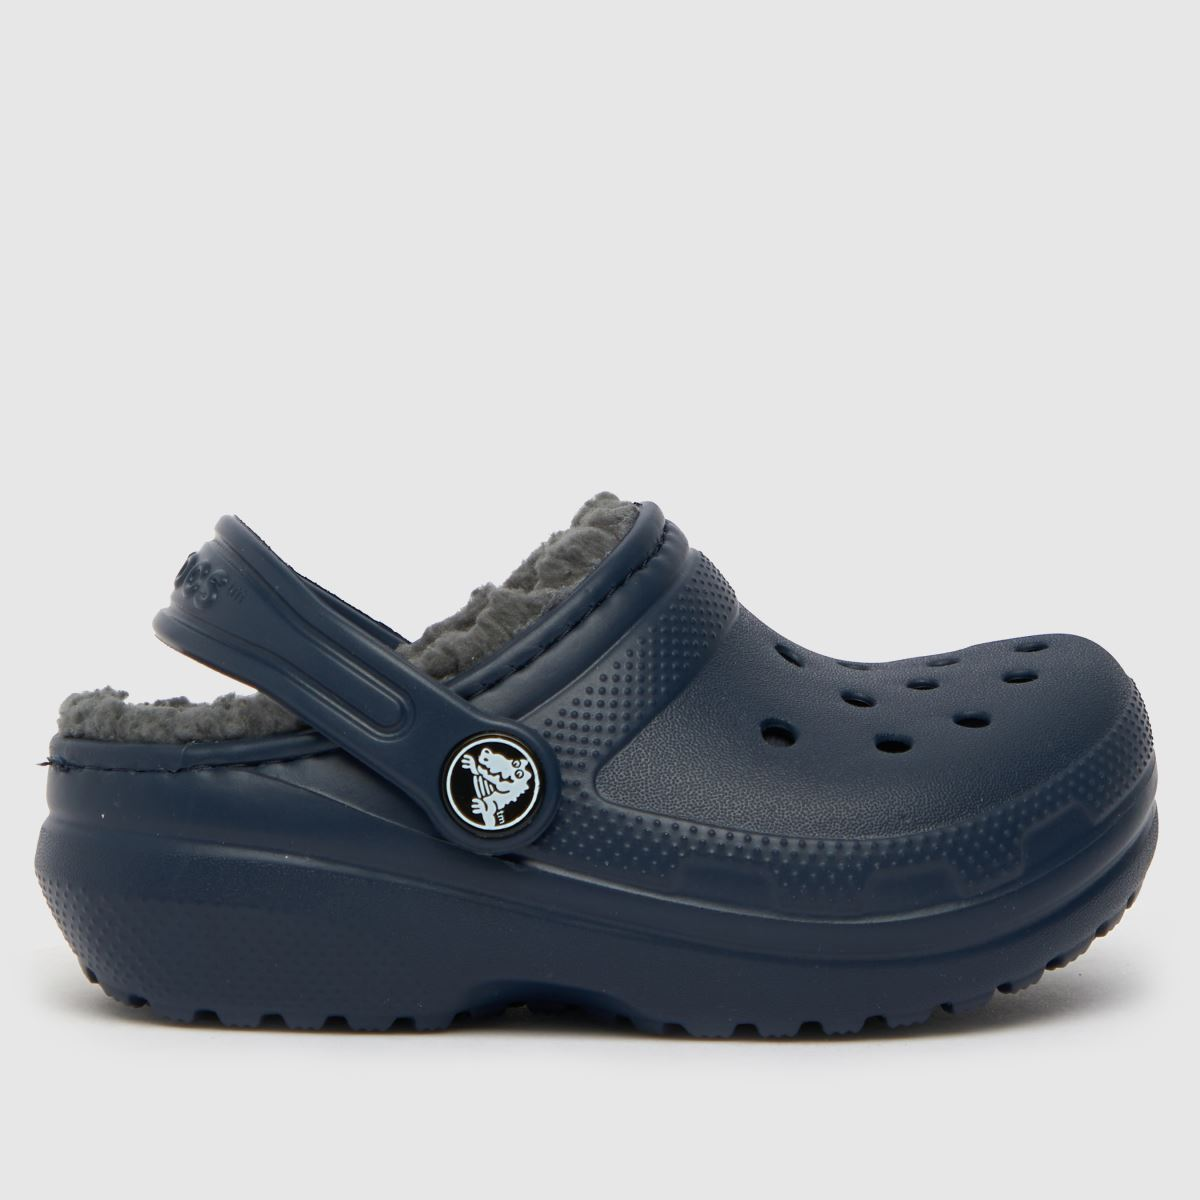 Crocs Navy & Grey Classic Lined Clog Sandals Toddler